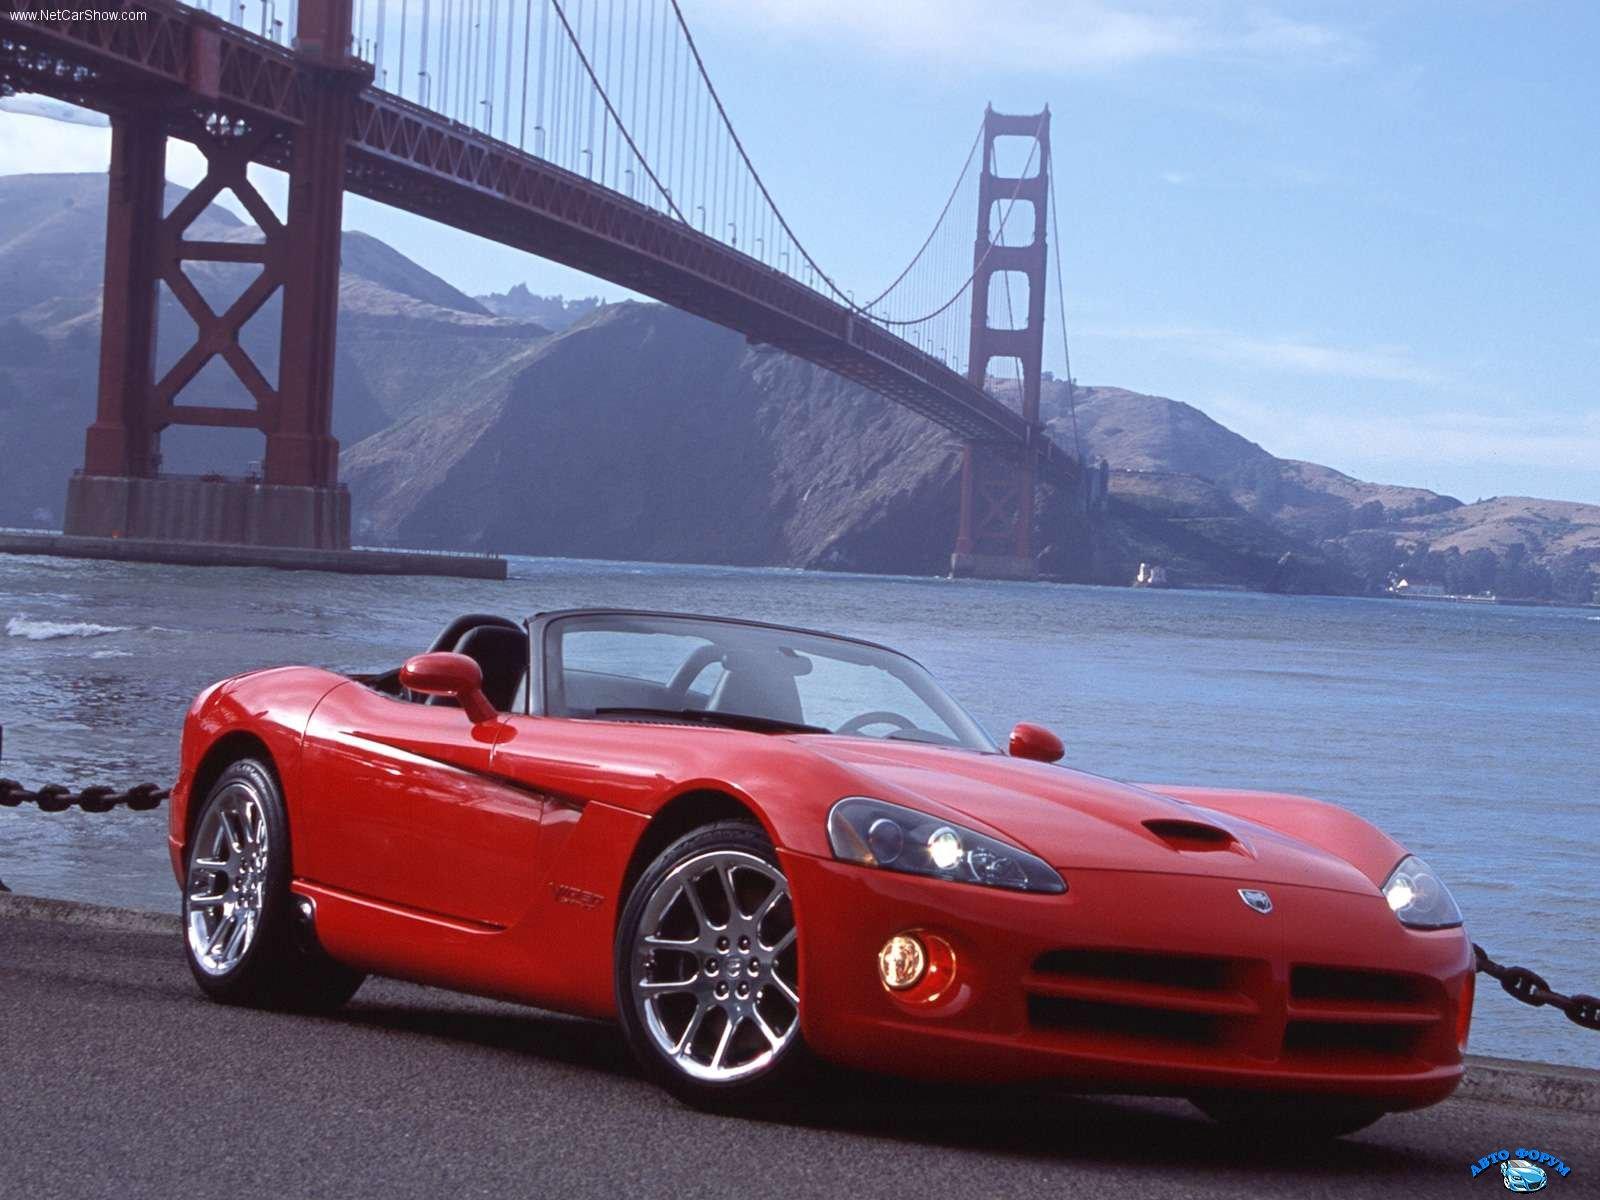 2003-dodge-viper-srt-10-front-2.jpg